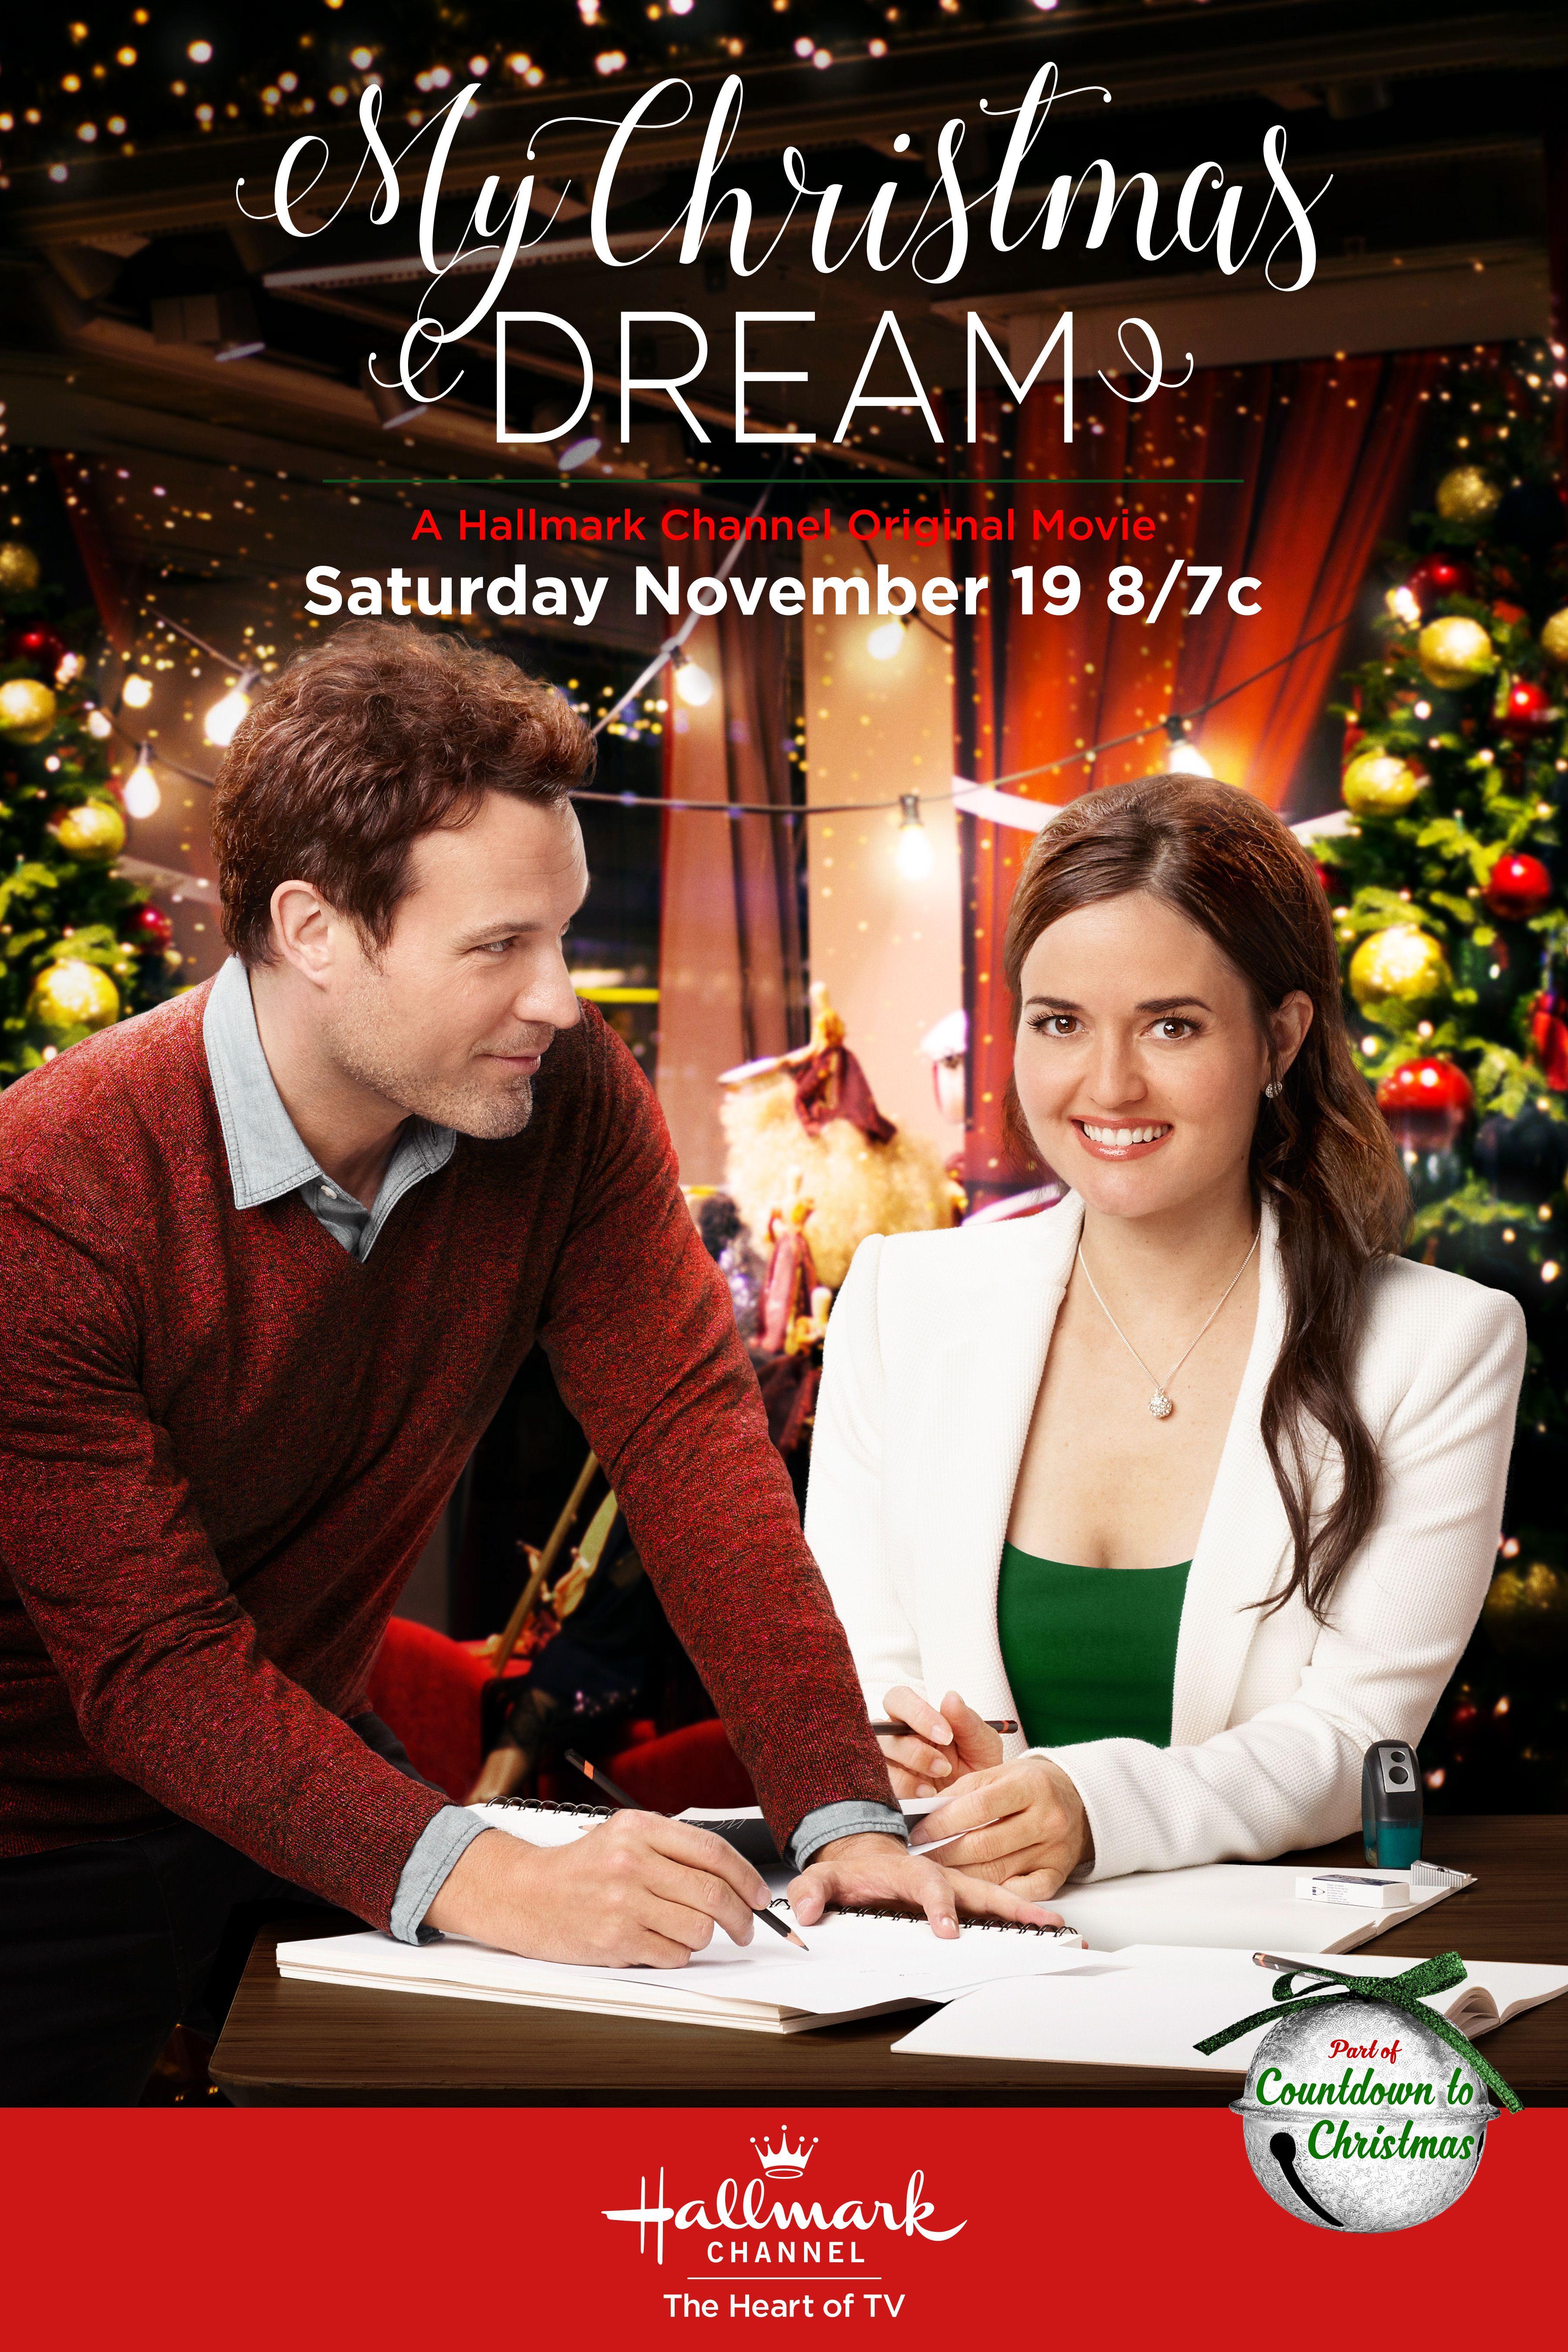 My Christmas Dream 2019.My Christmas Dream 2016 More Revolucion Audiovisual In